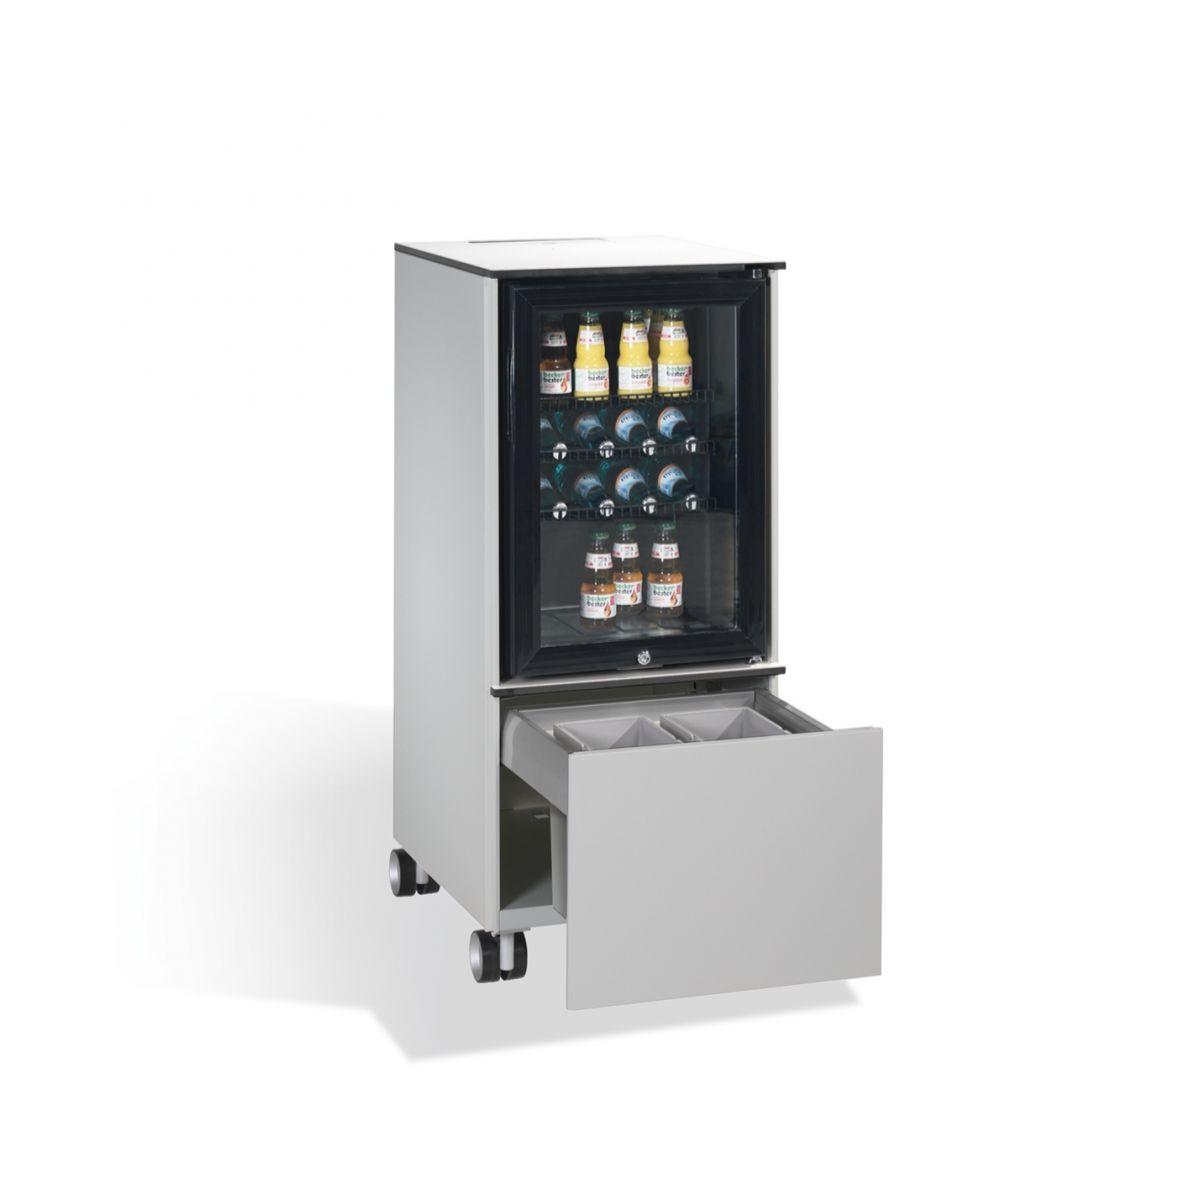 Kühlschrank Caddy mit Abfallsammler RAL 7035 lichtgrau